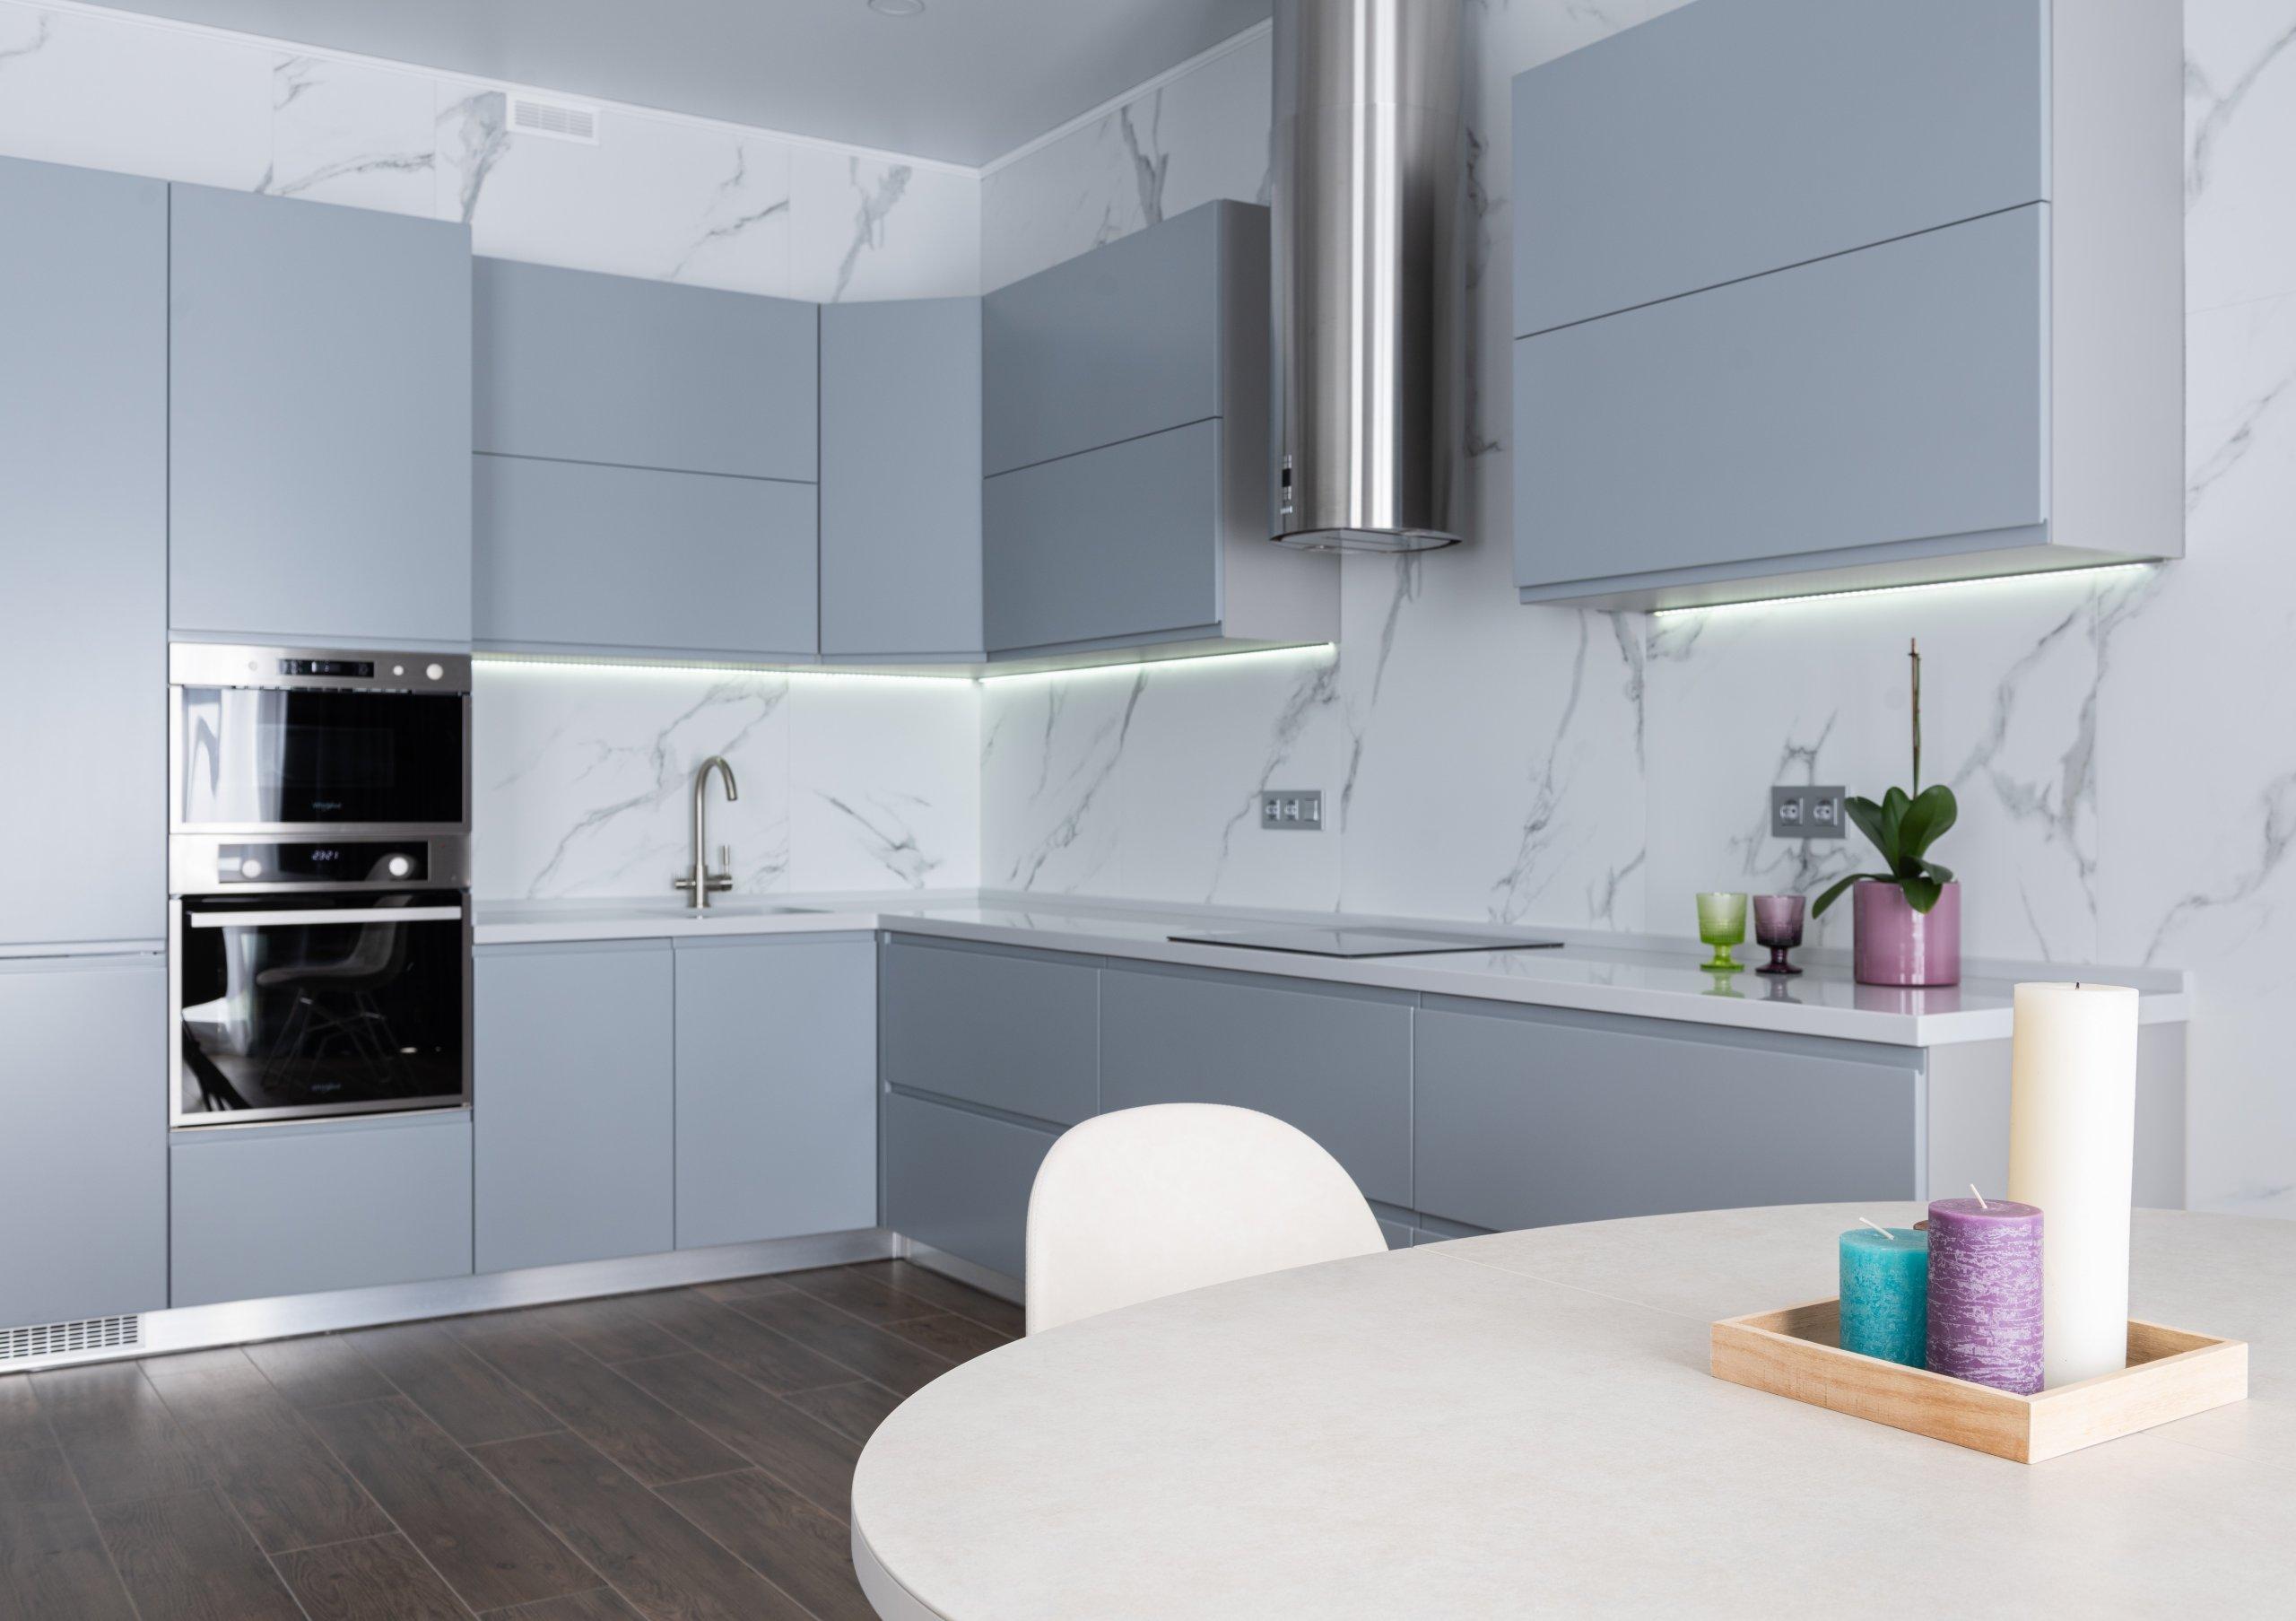 laminate-kitchen-countertop-material